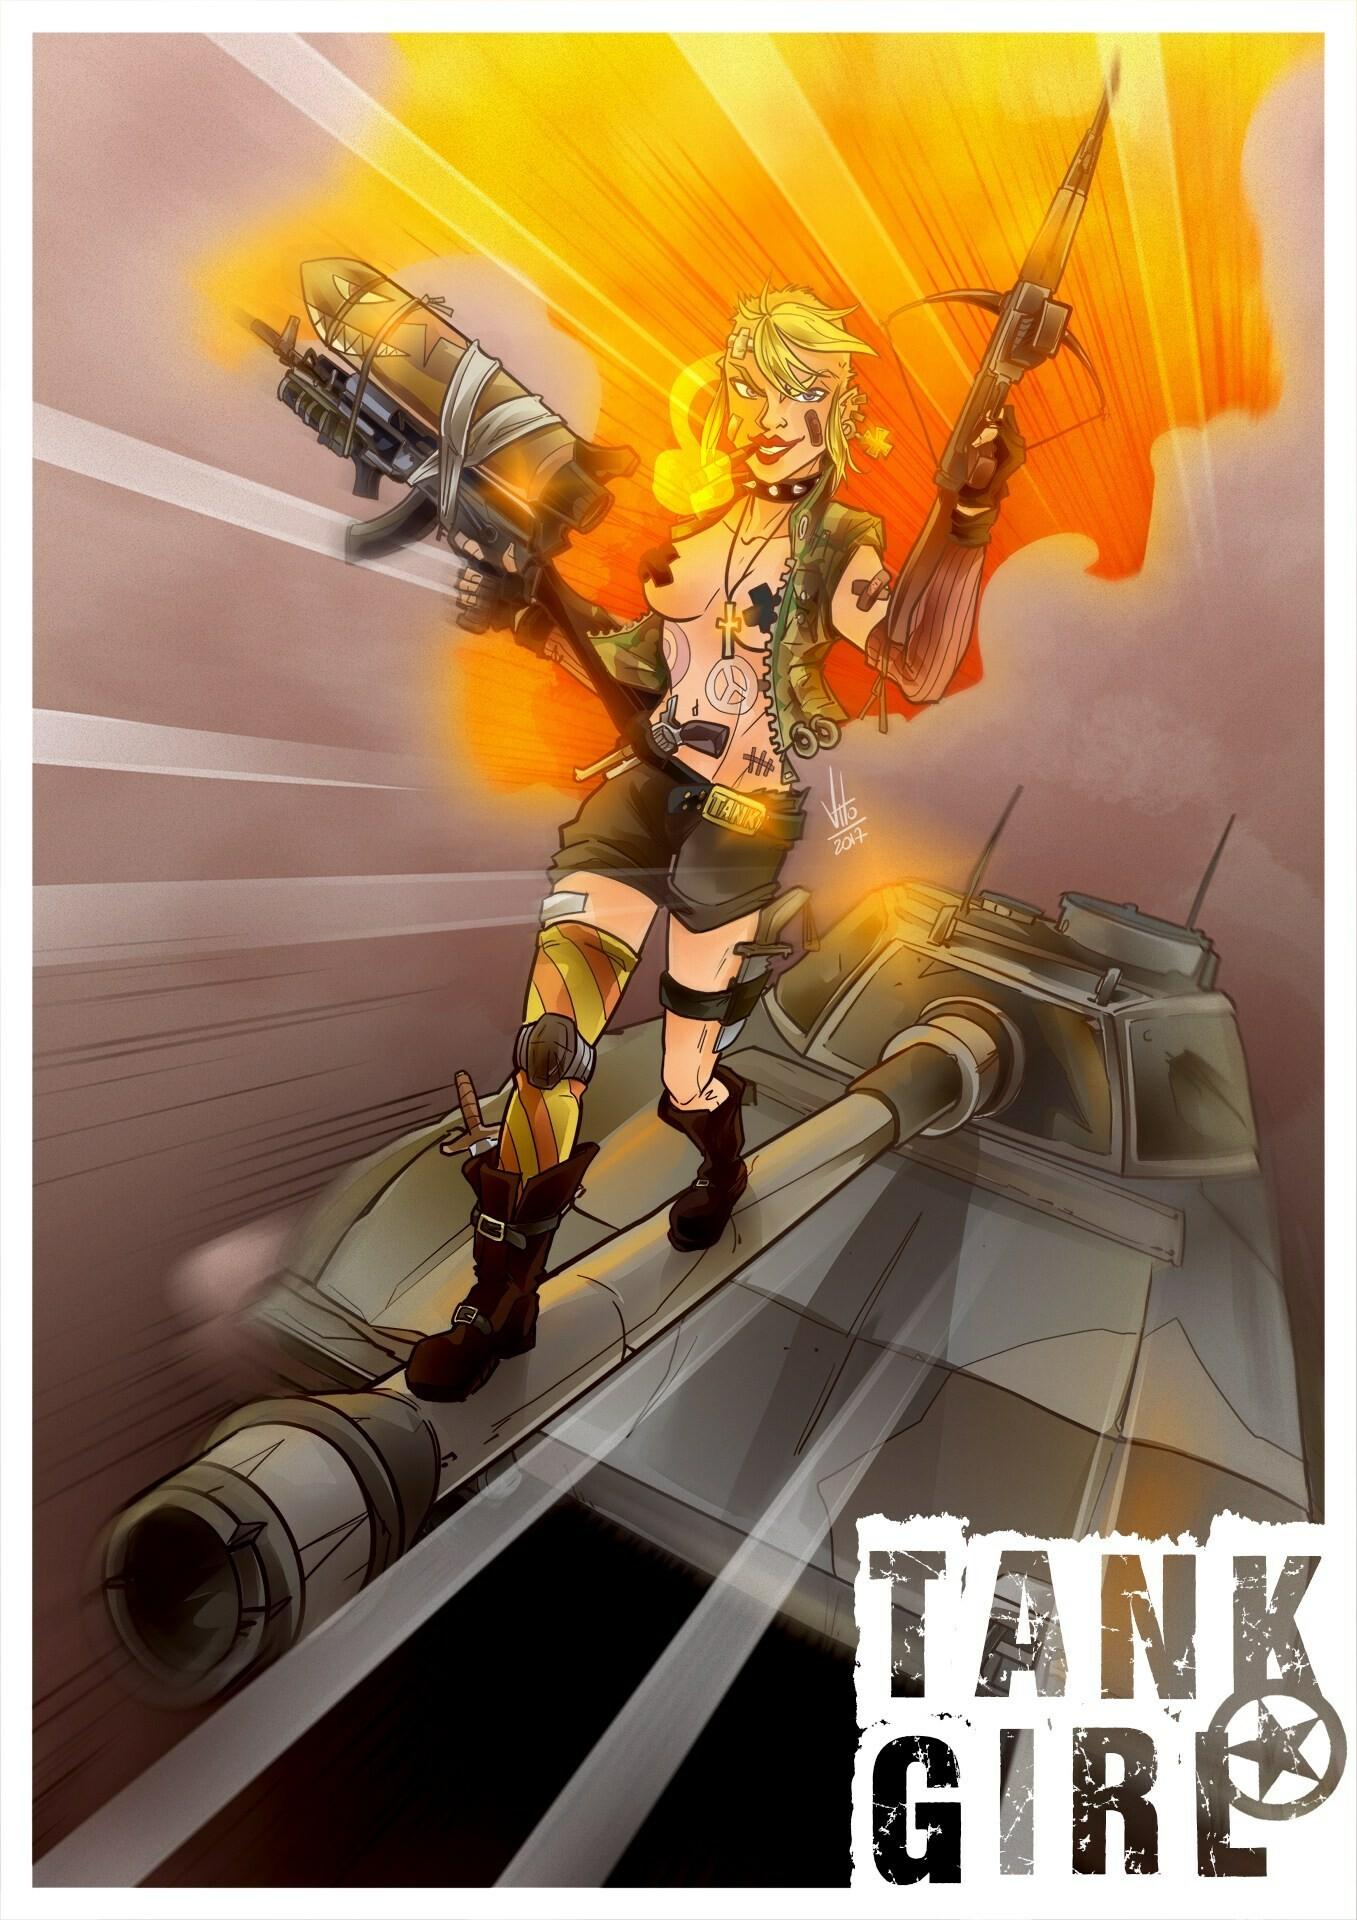 Vito potenza 21 tank girl 2 1